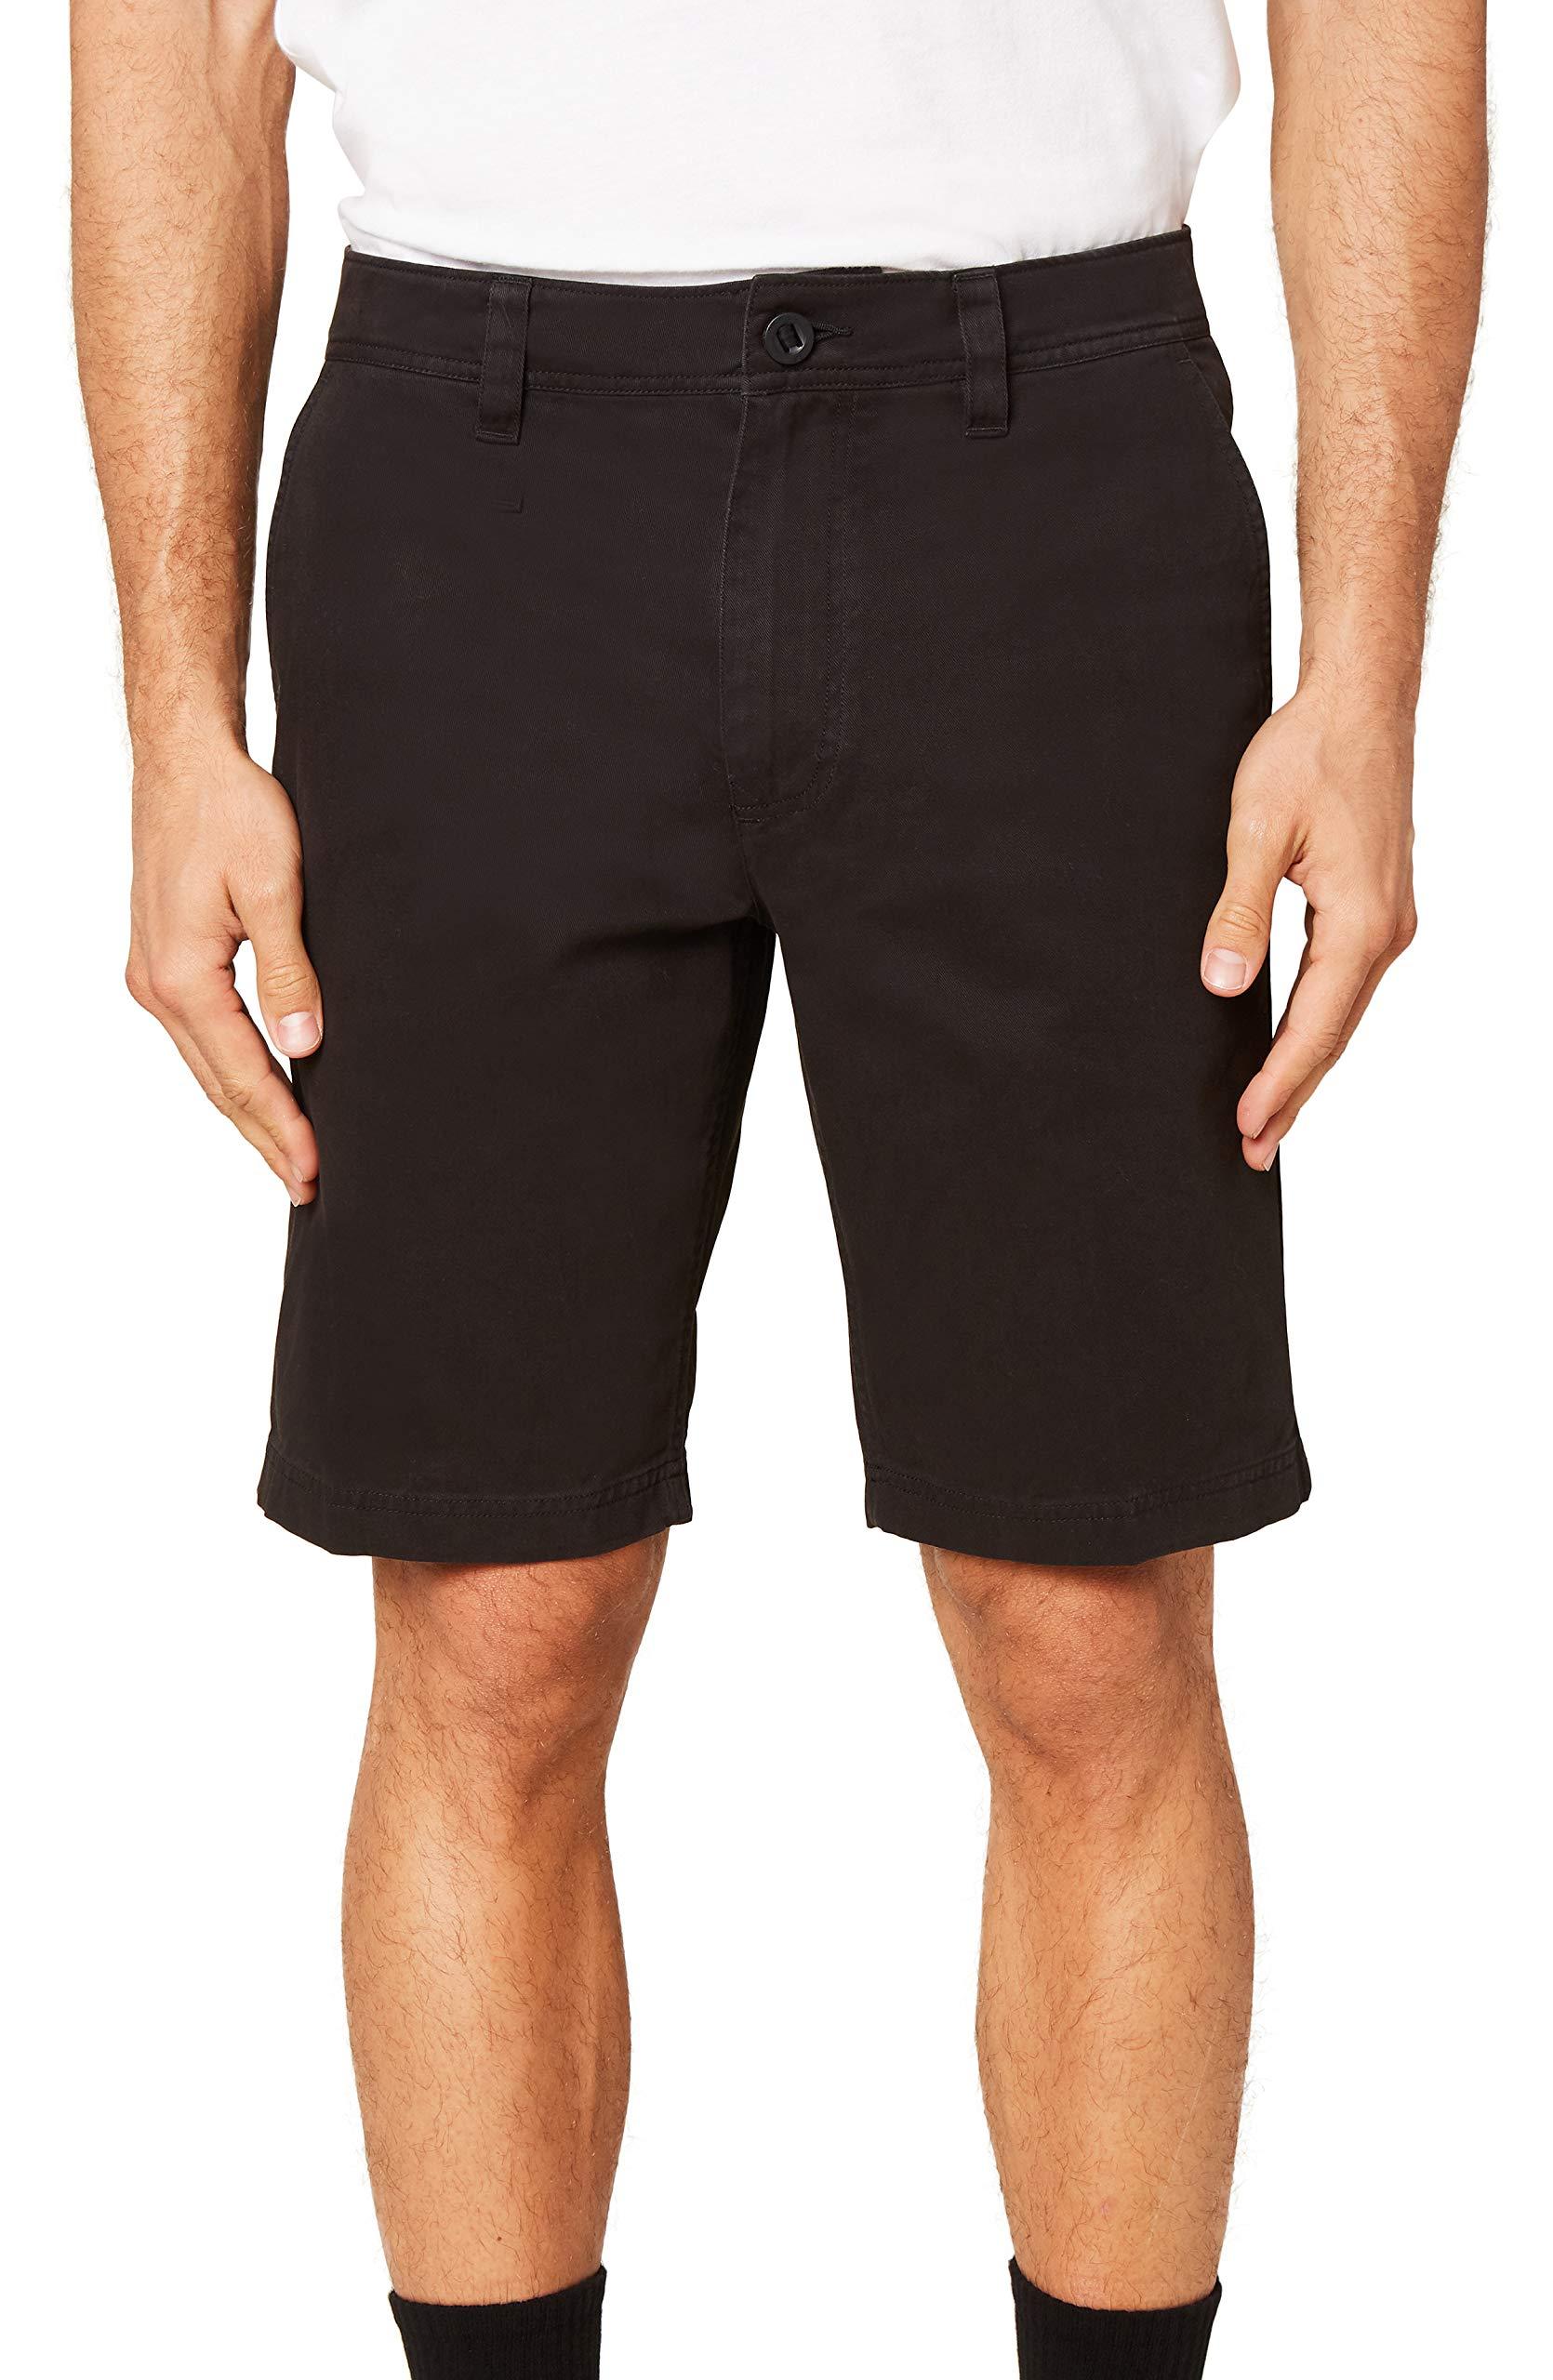 O'NEILL Men's Standard Fit Walk Short, 20 Inch Outseam   Mid-Length Short  